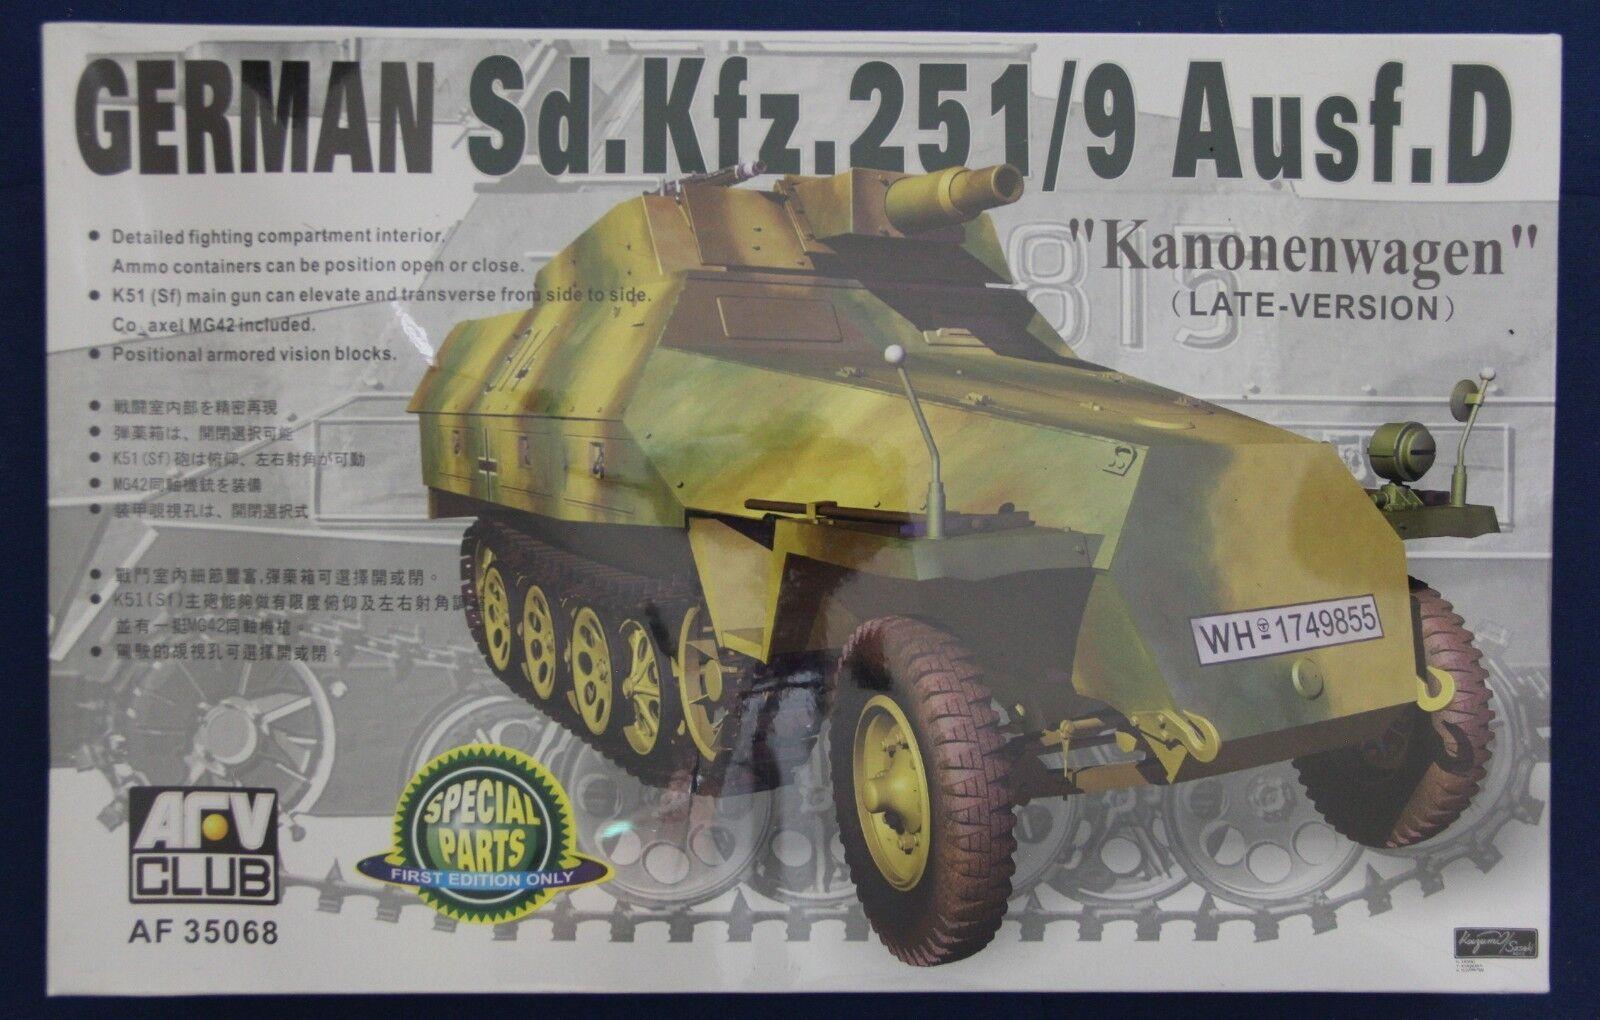 afv club 35068 1 1 35068  35 sdkfz.2519 ausf. d (in versione) kanonenwagen d8e4c8